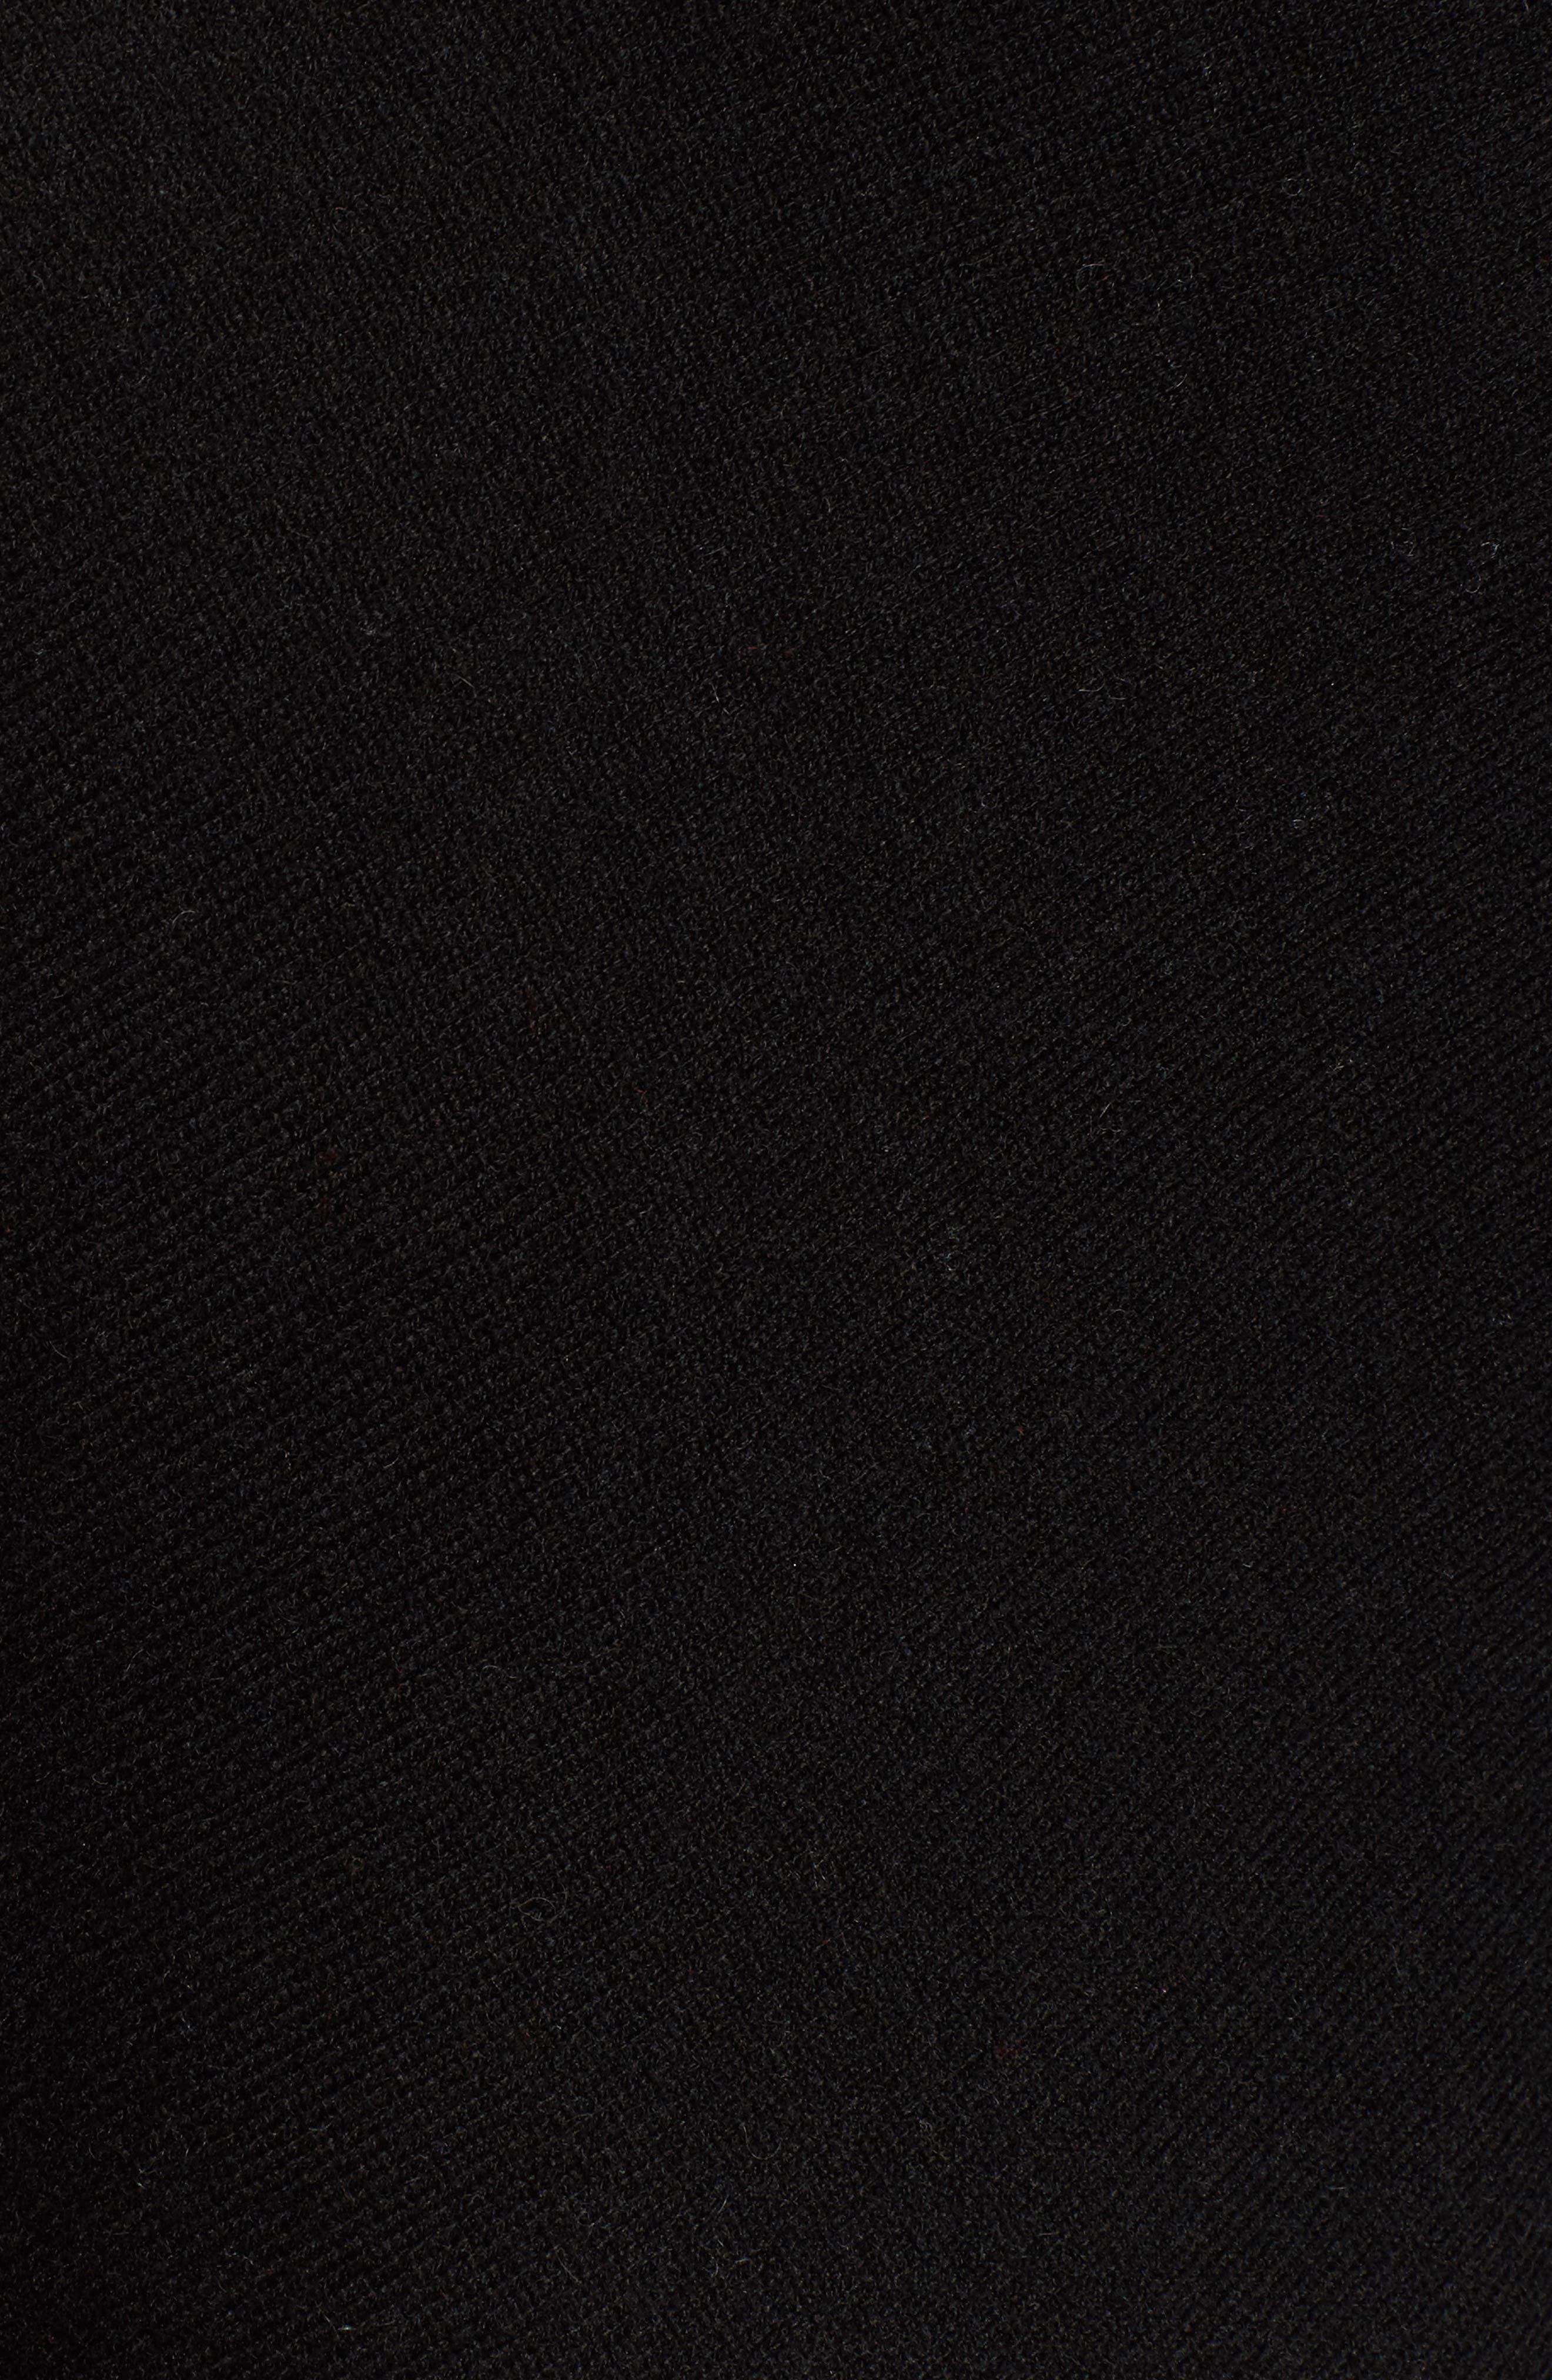 Convertible Cashmere Poncho,                             Alternate thumbnail 5, color,                             BLACK